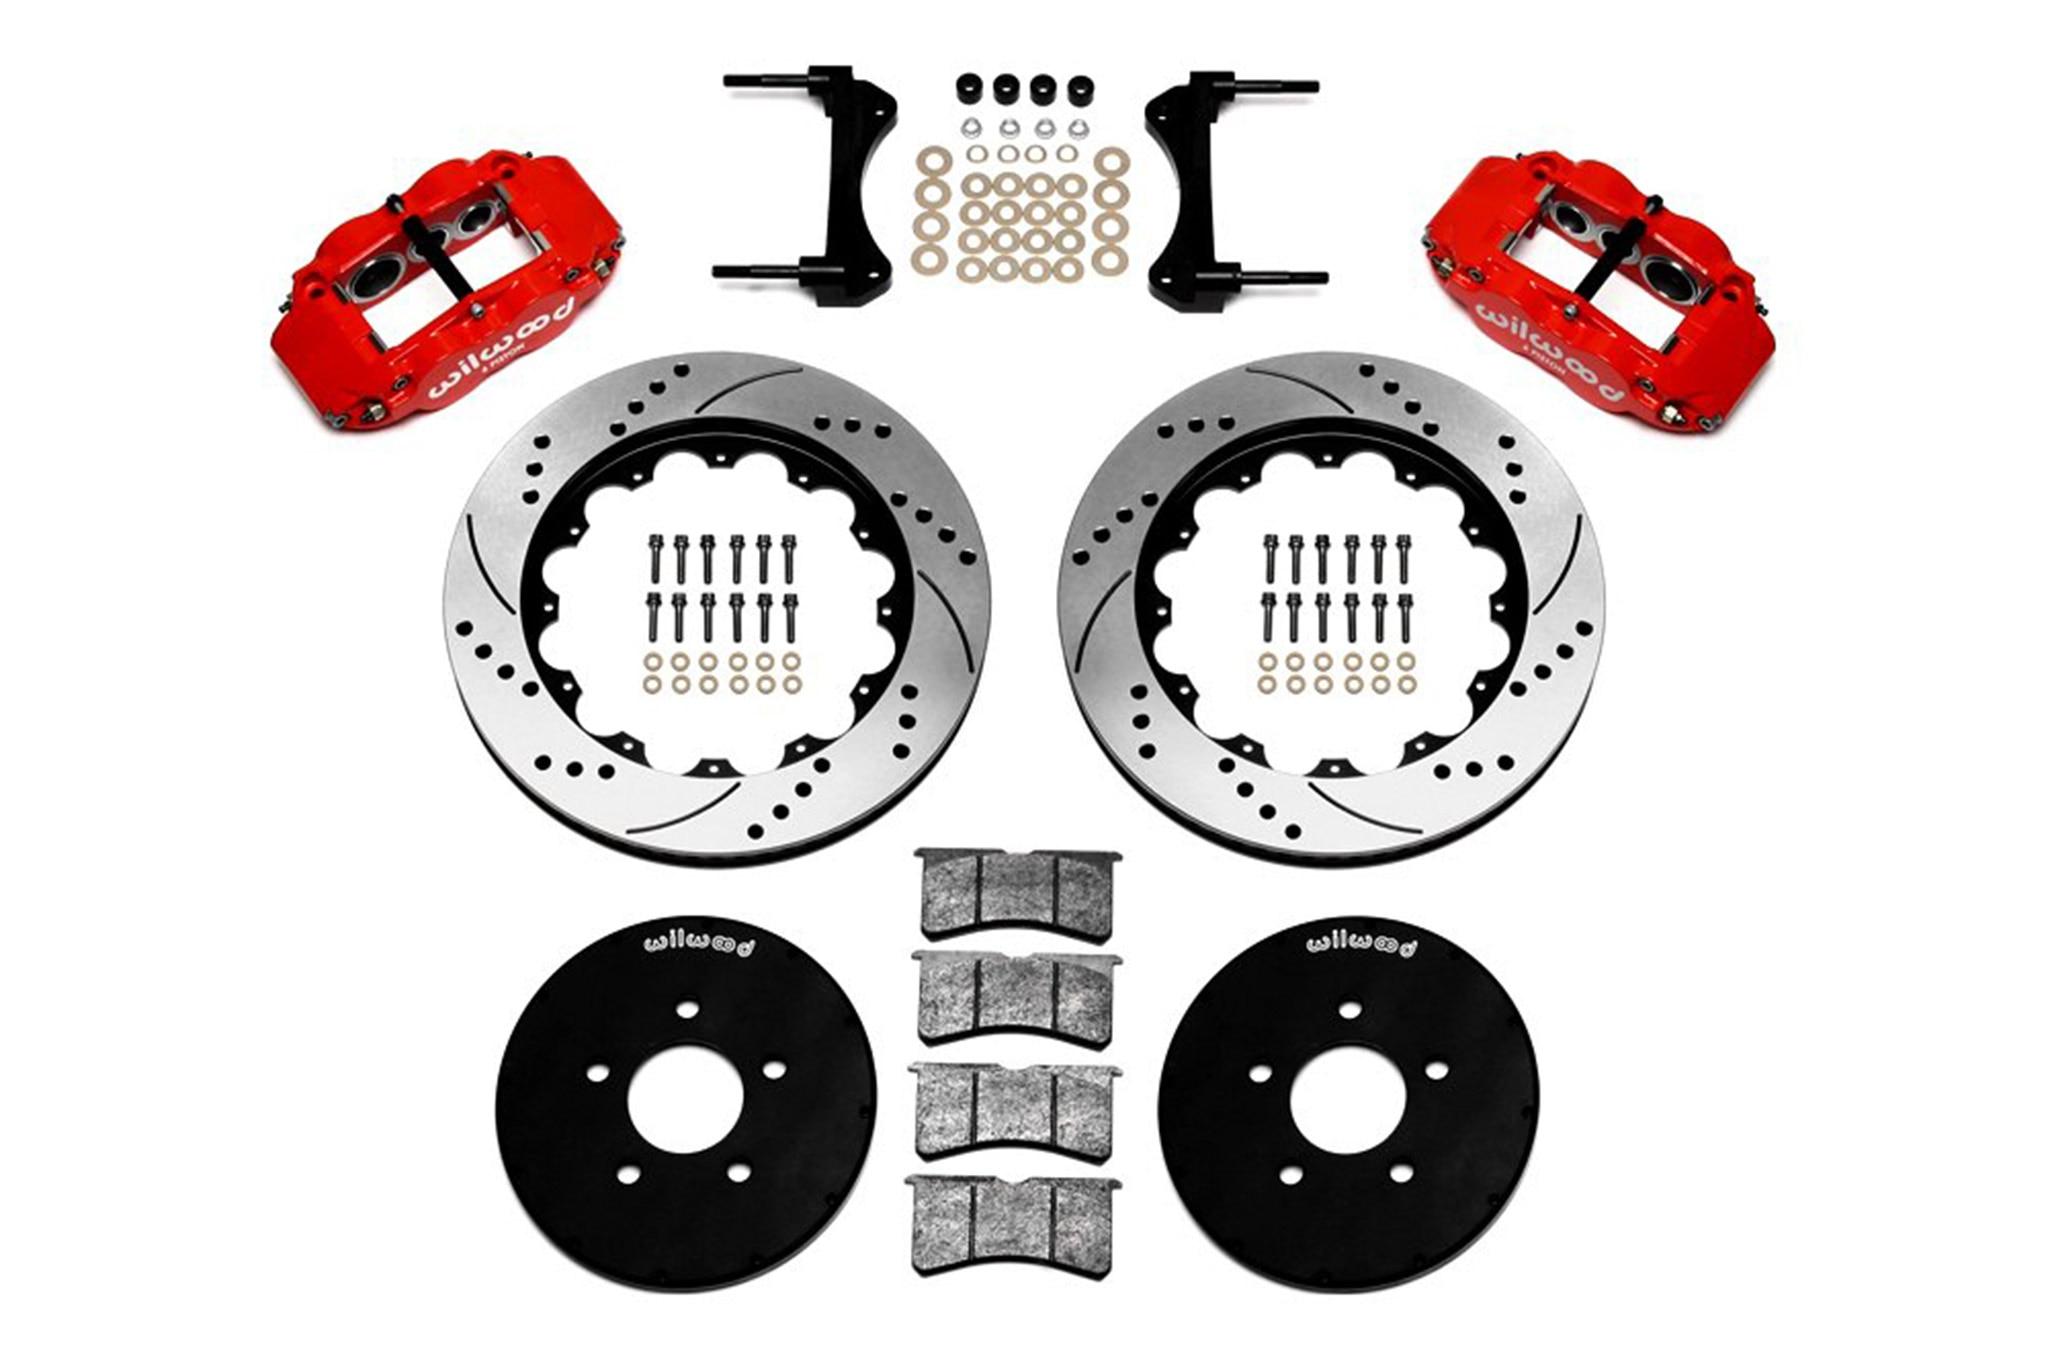 02 Wilwood Big Brake Upgrade Superlite 6r Parts